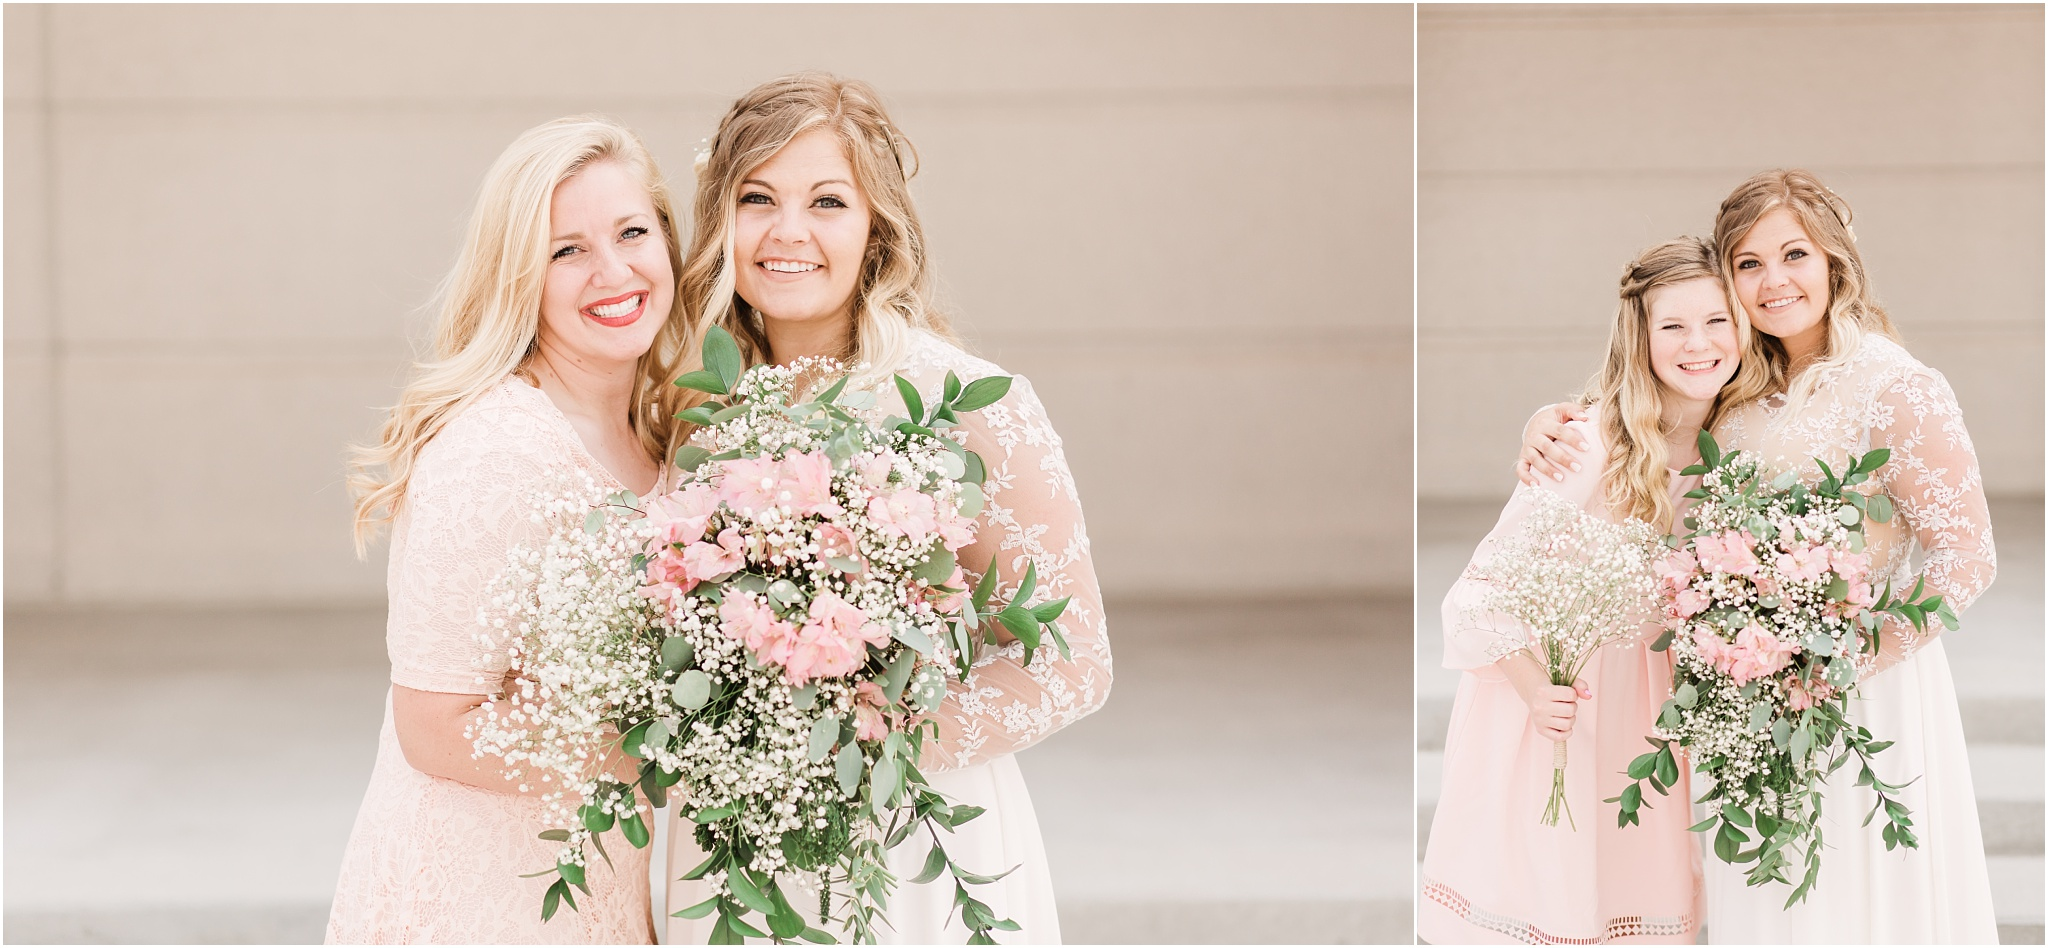 Wedding Photography_Meridian Idaho Temple_Boise Idaho_Nampa Idaho_Leah Southwick Photography_0040.jpg